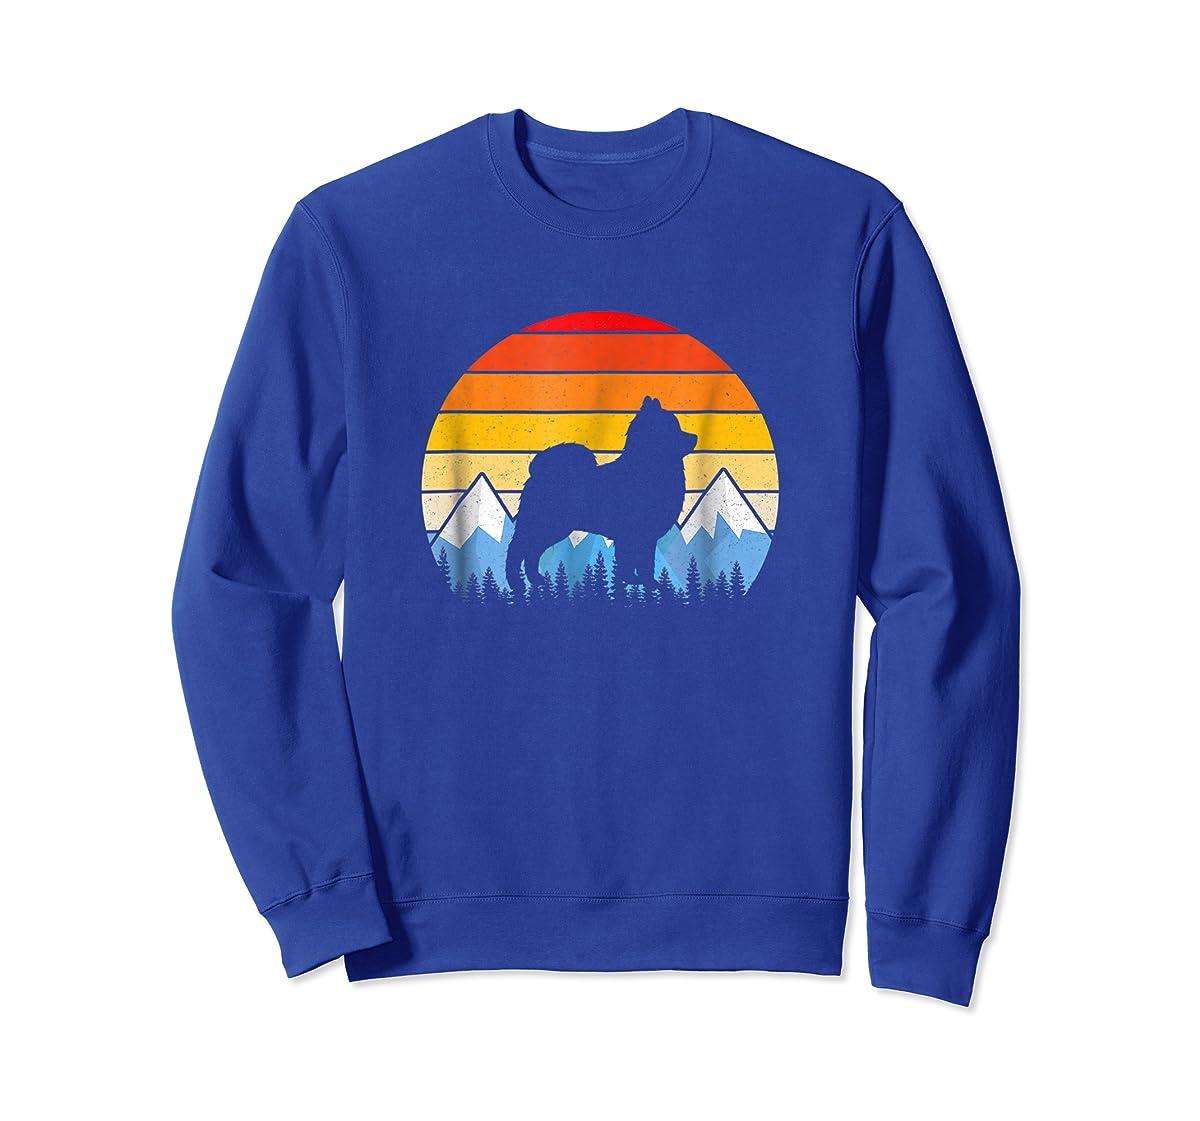 Vintage Retro Pomeranian Lovers Gifts Pomeranian T Shirts-Sweatshirt-Royal